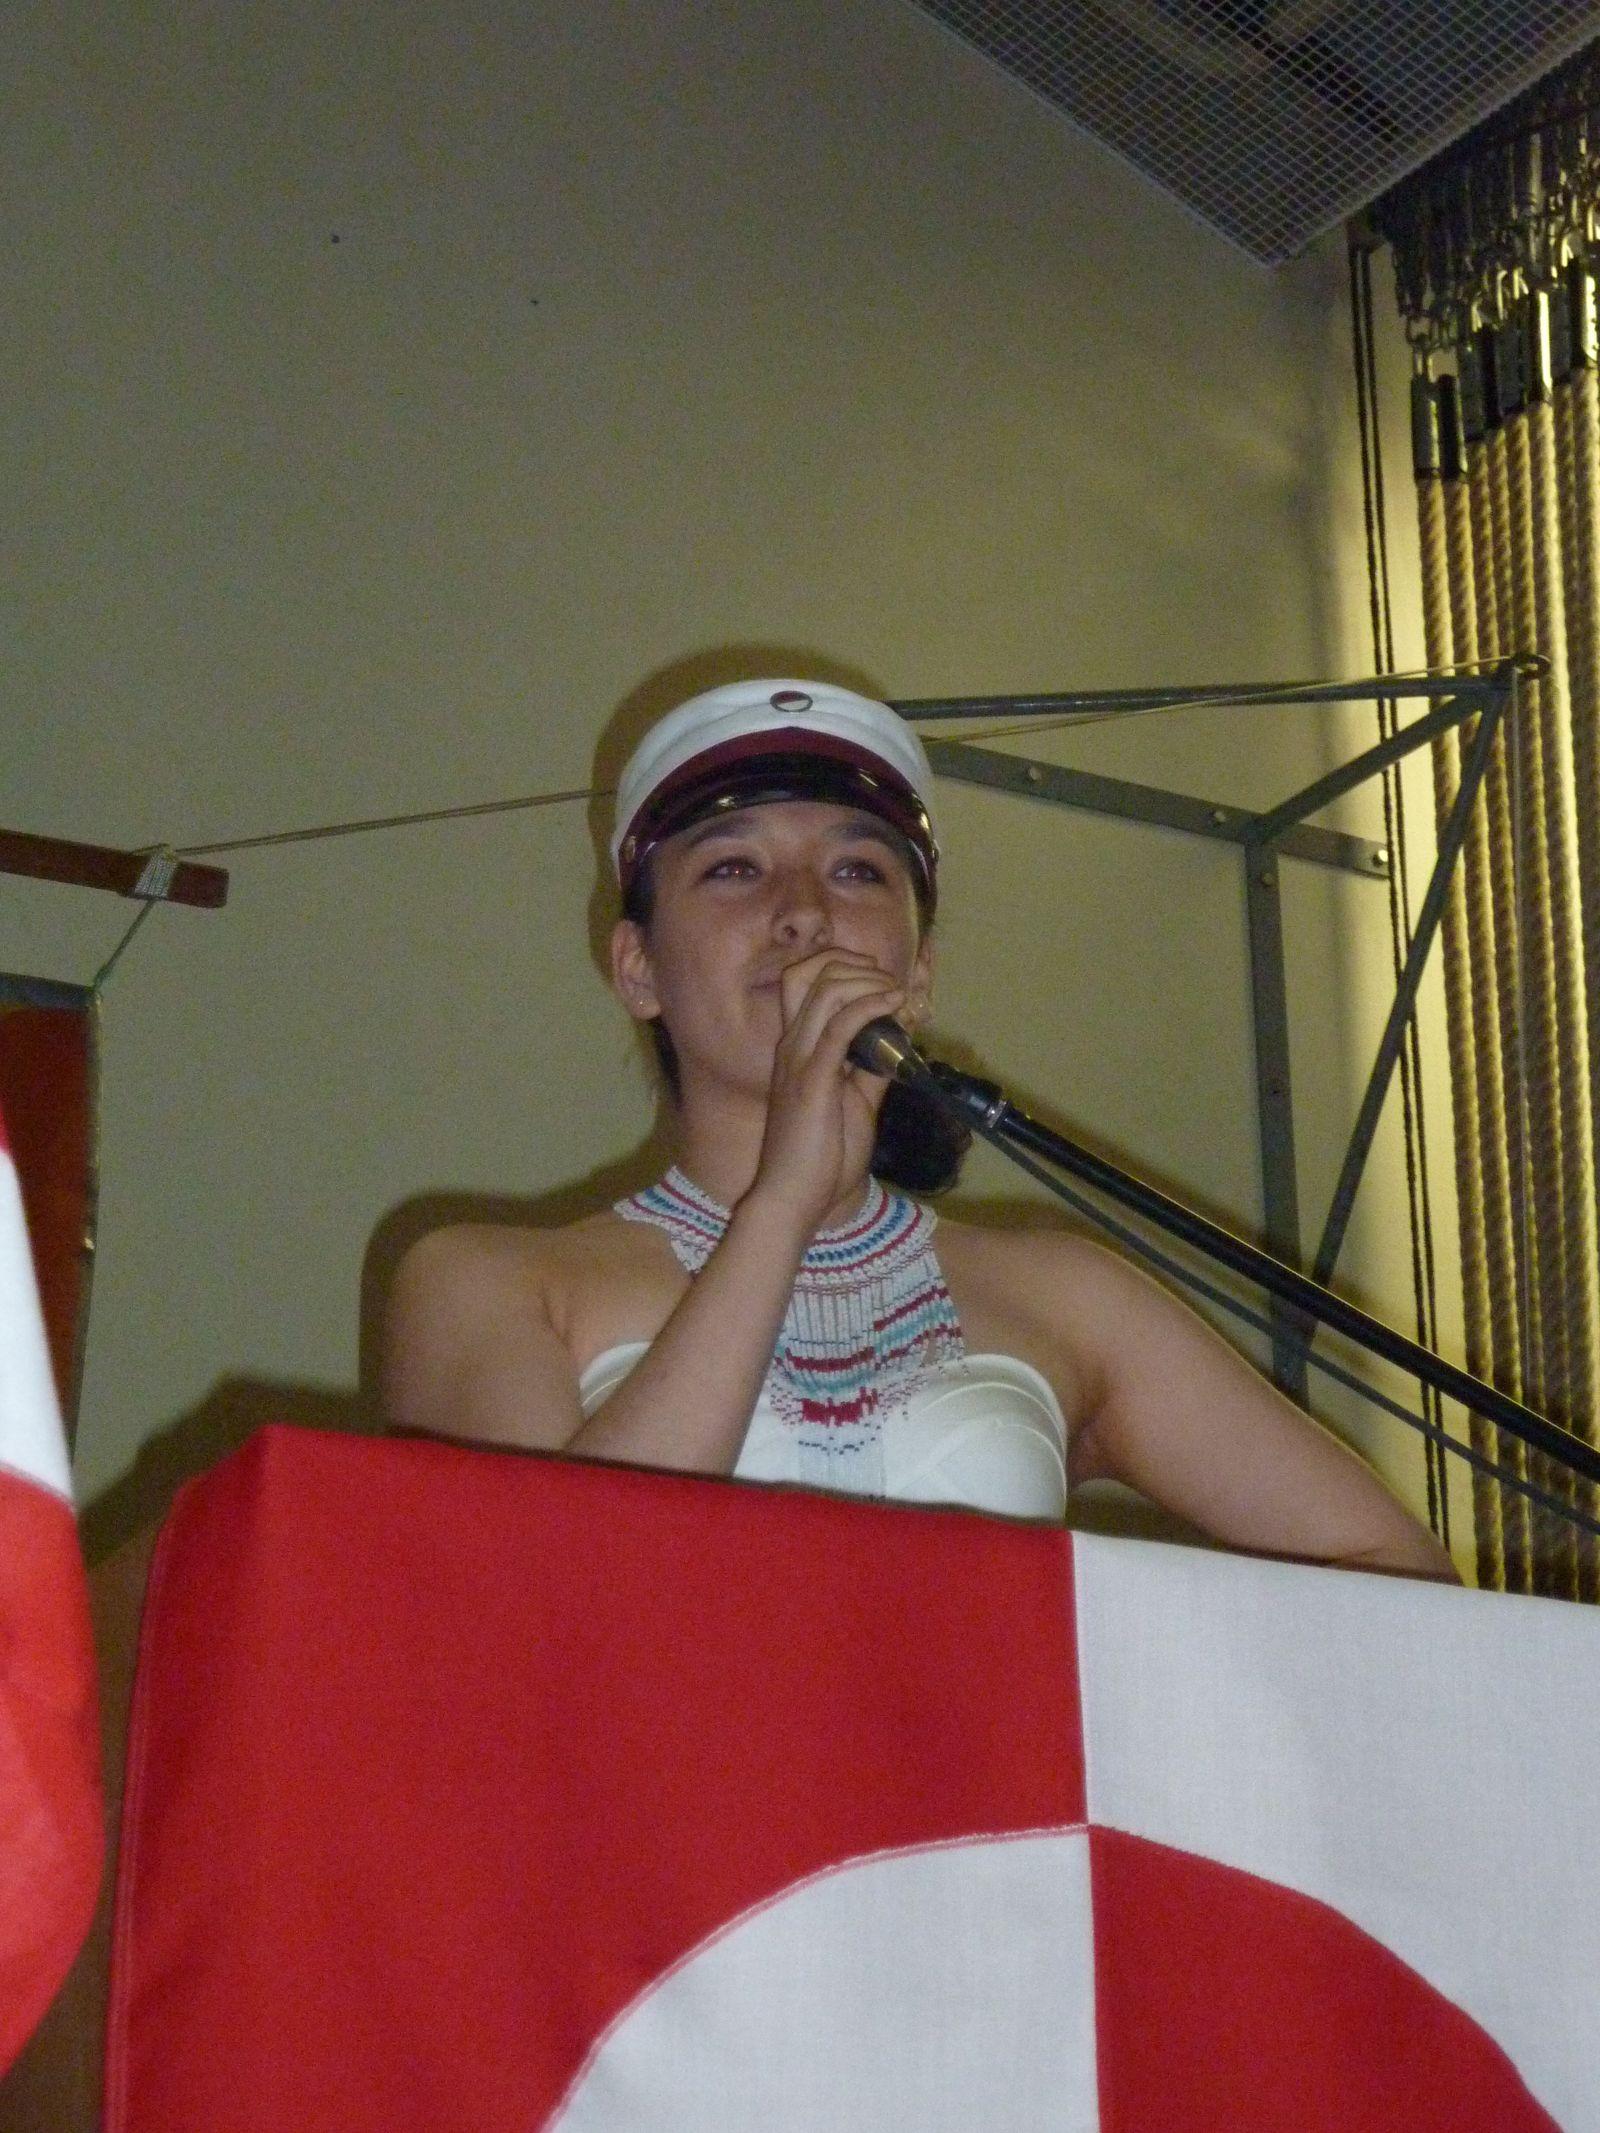 Dimissionsfest i Nuuk Ivalo Lynge Labansen holder tale